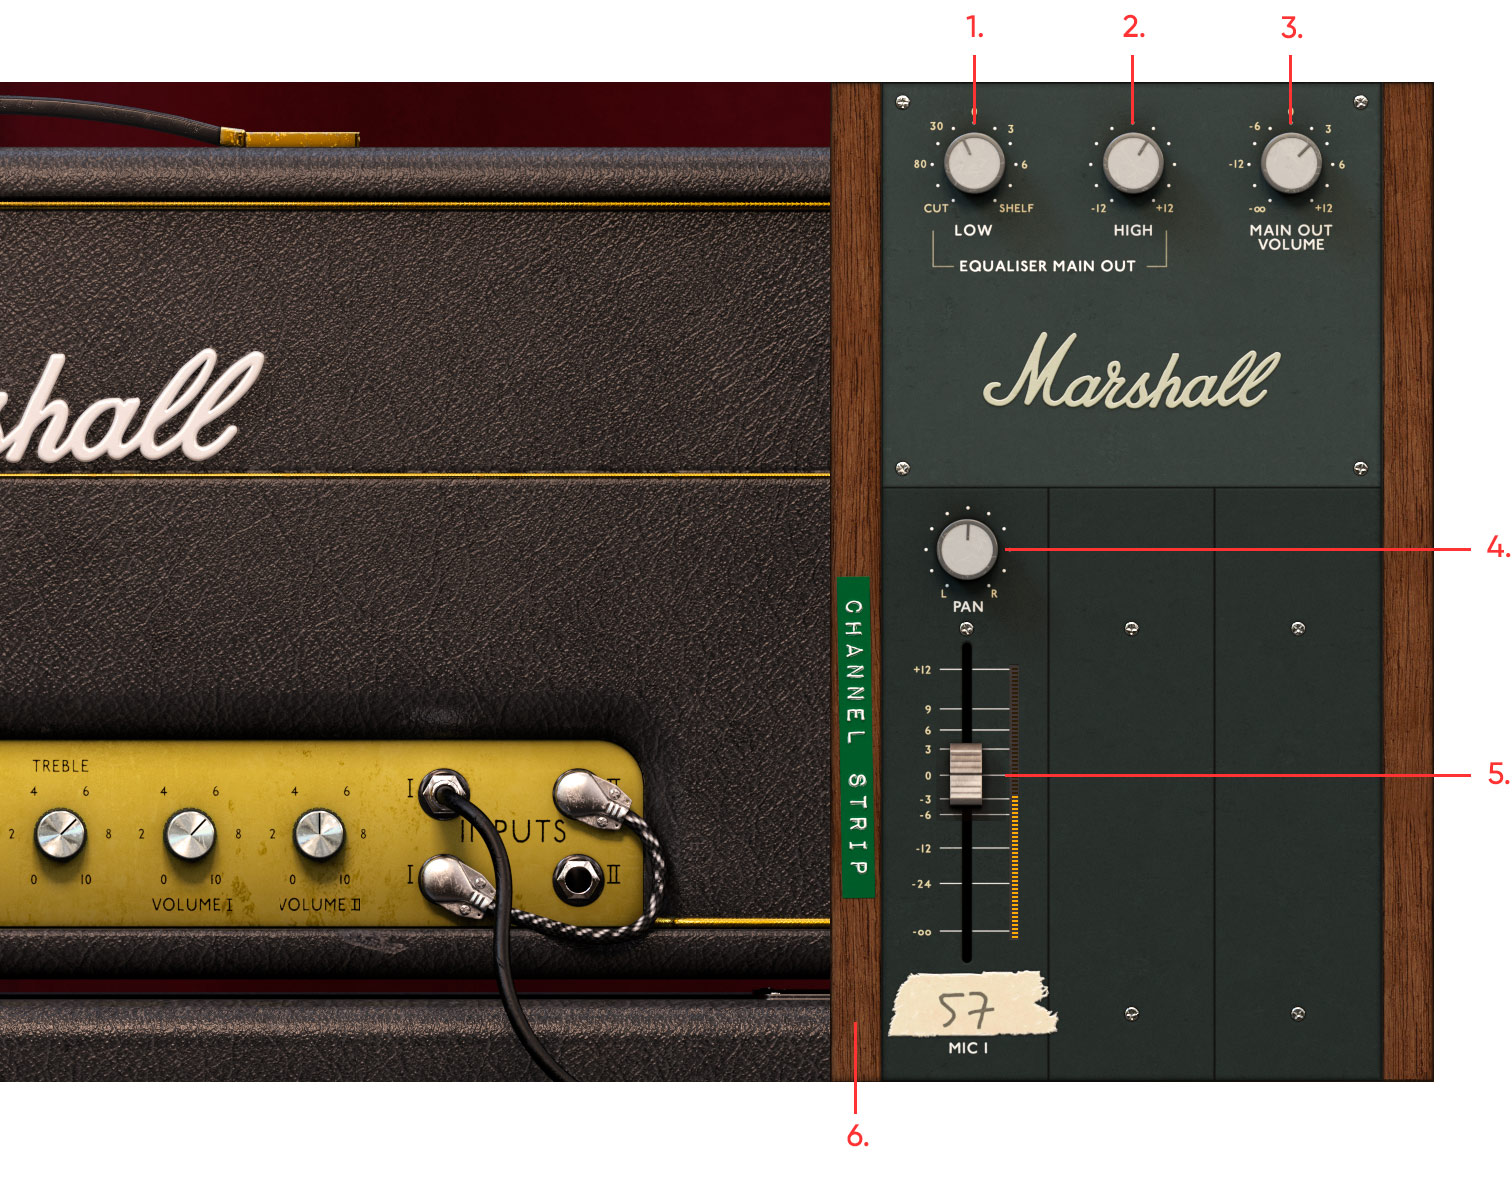 marshall-plexi-classic-user-interface-side-panel.jpg